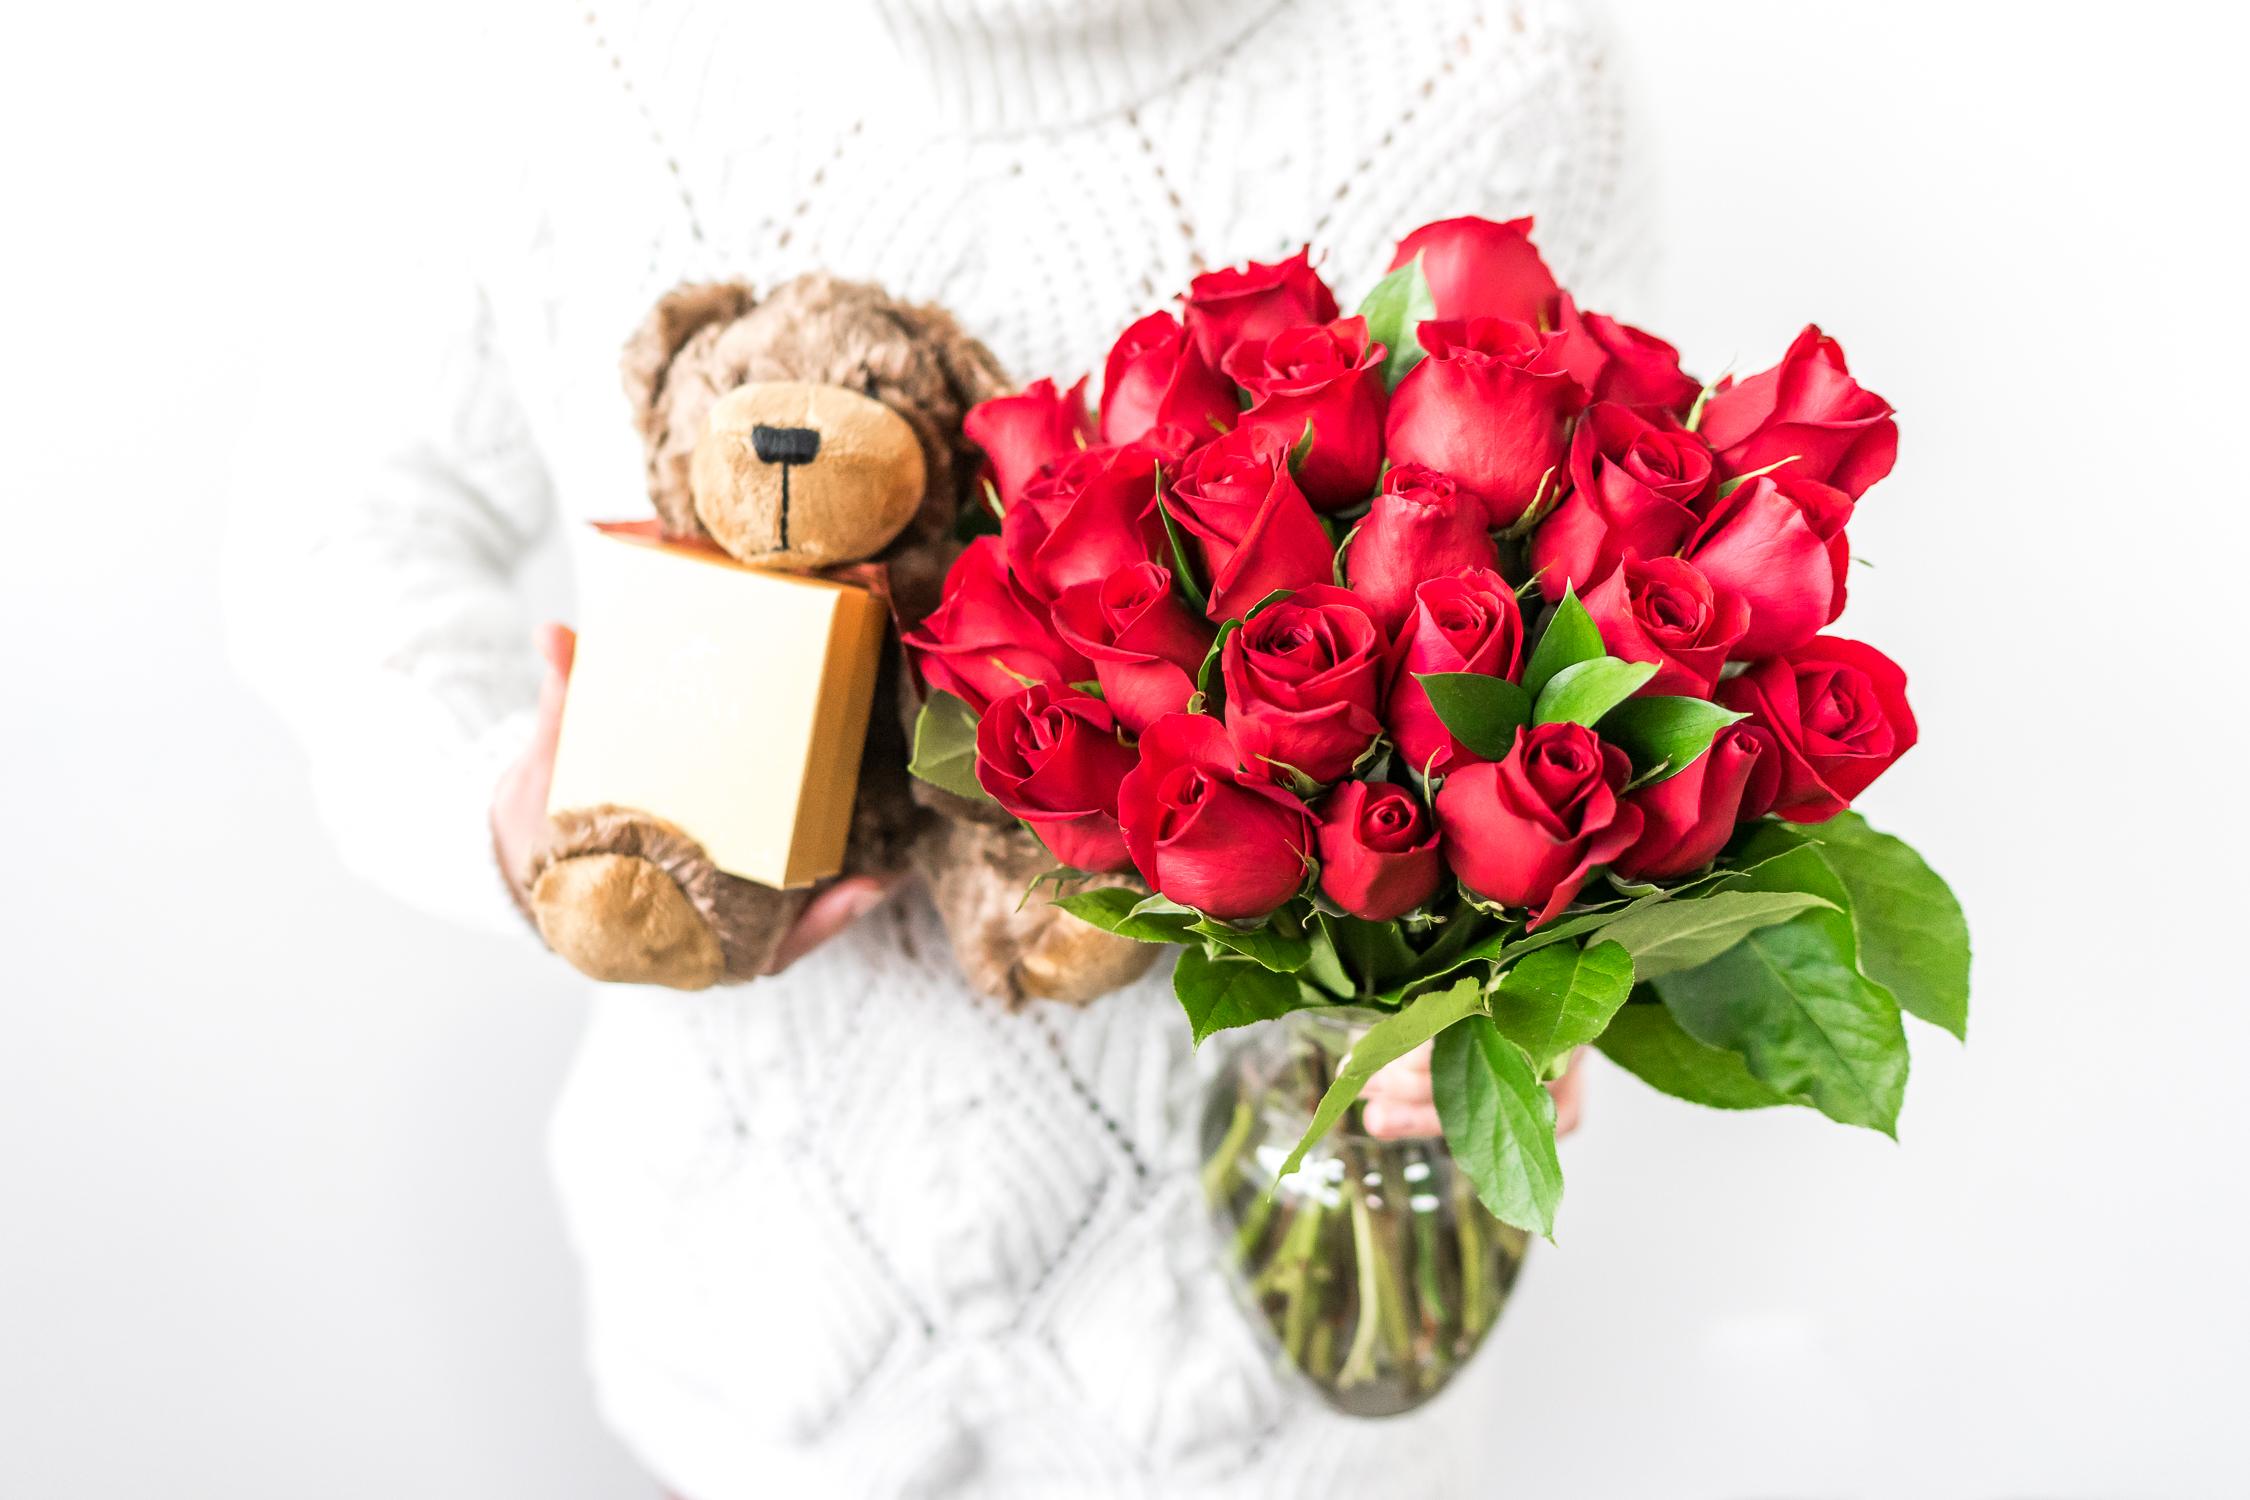 What Valentine's Flowers Do I Send?